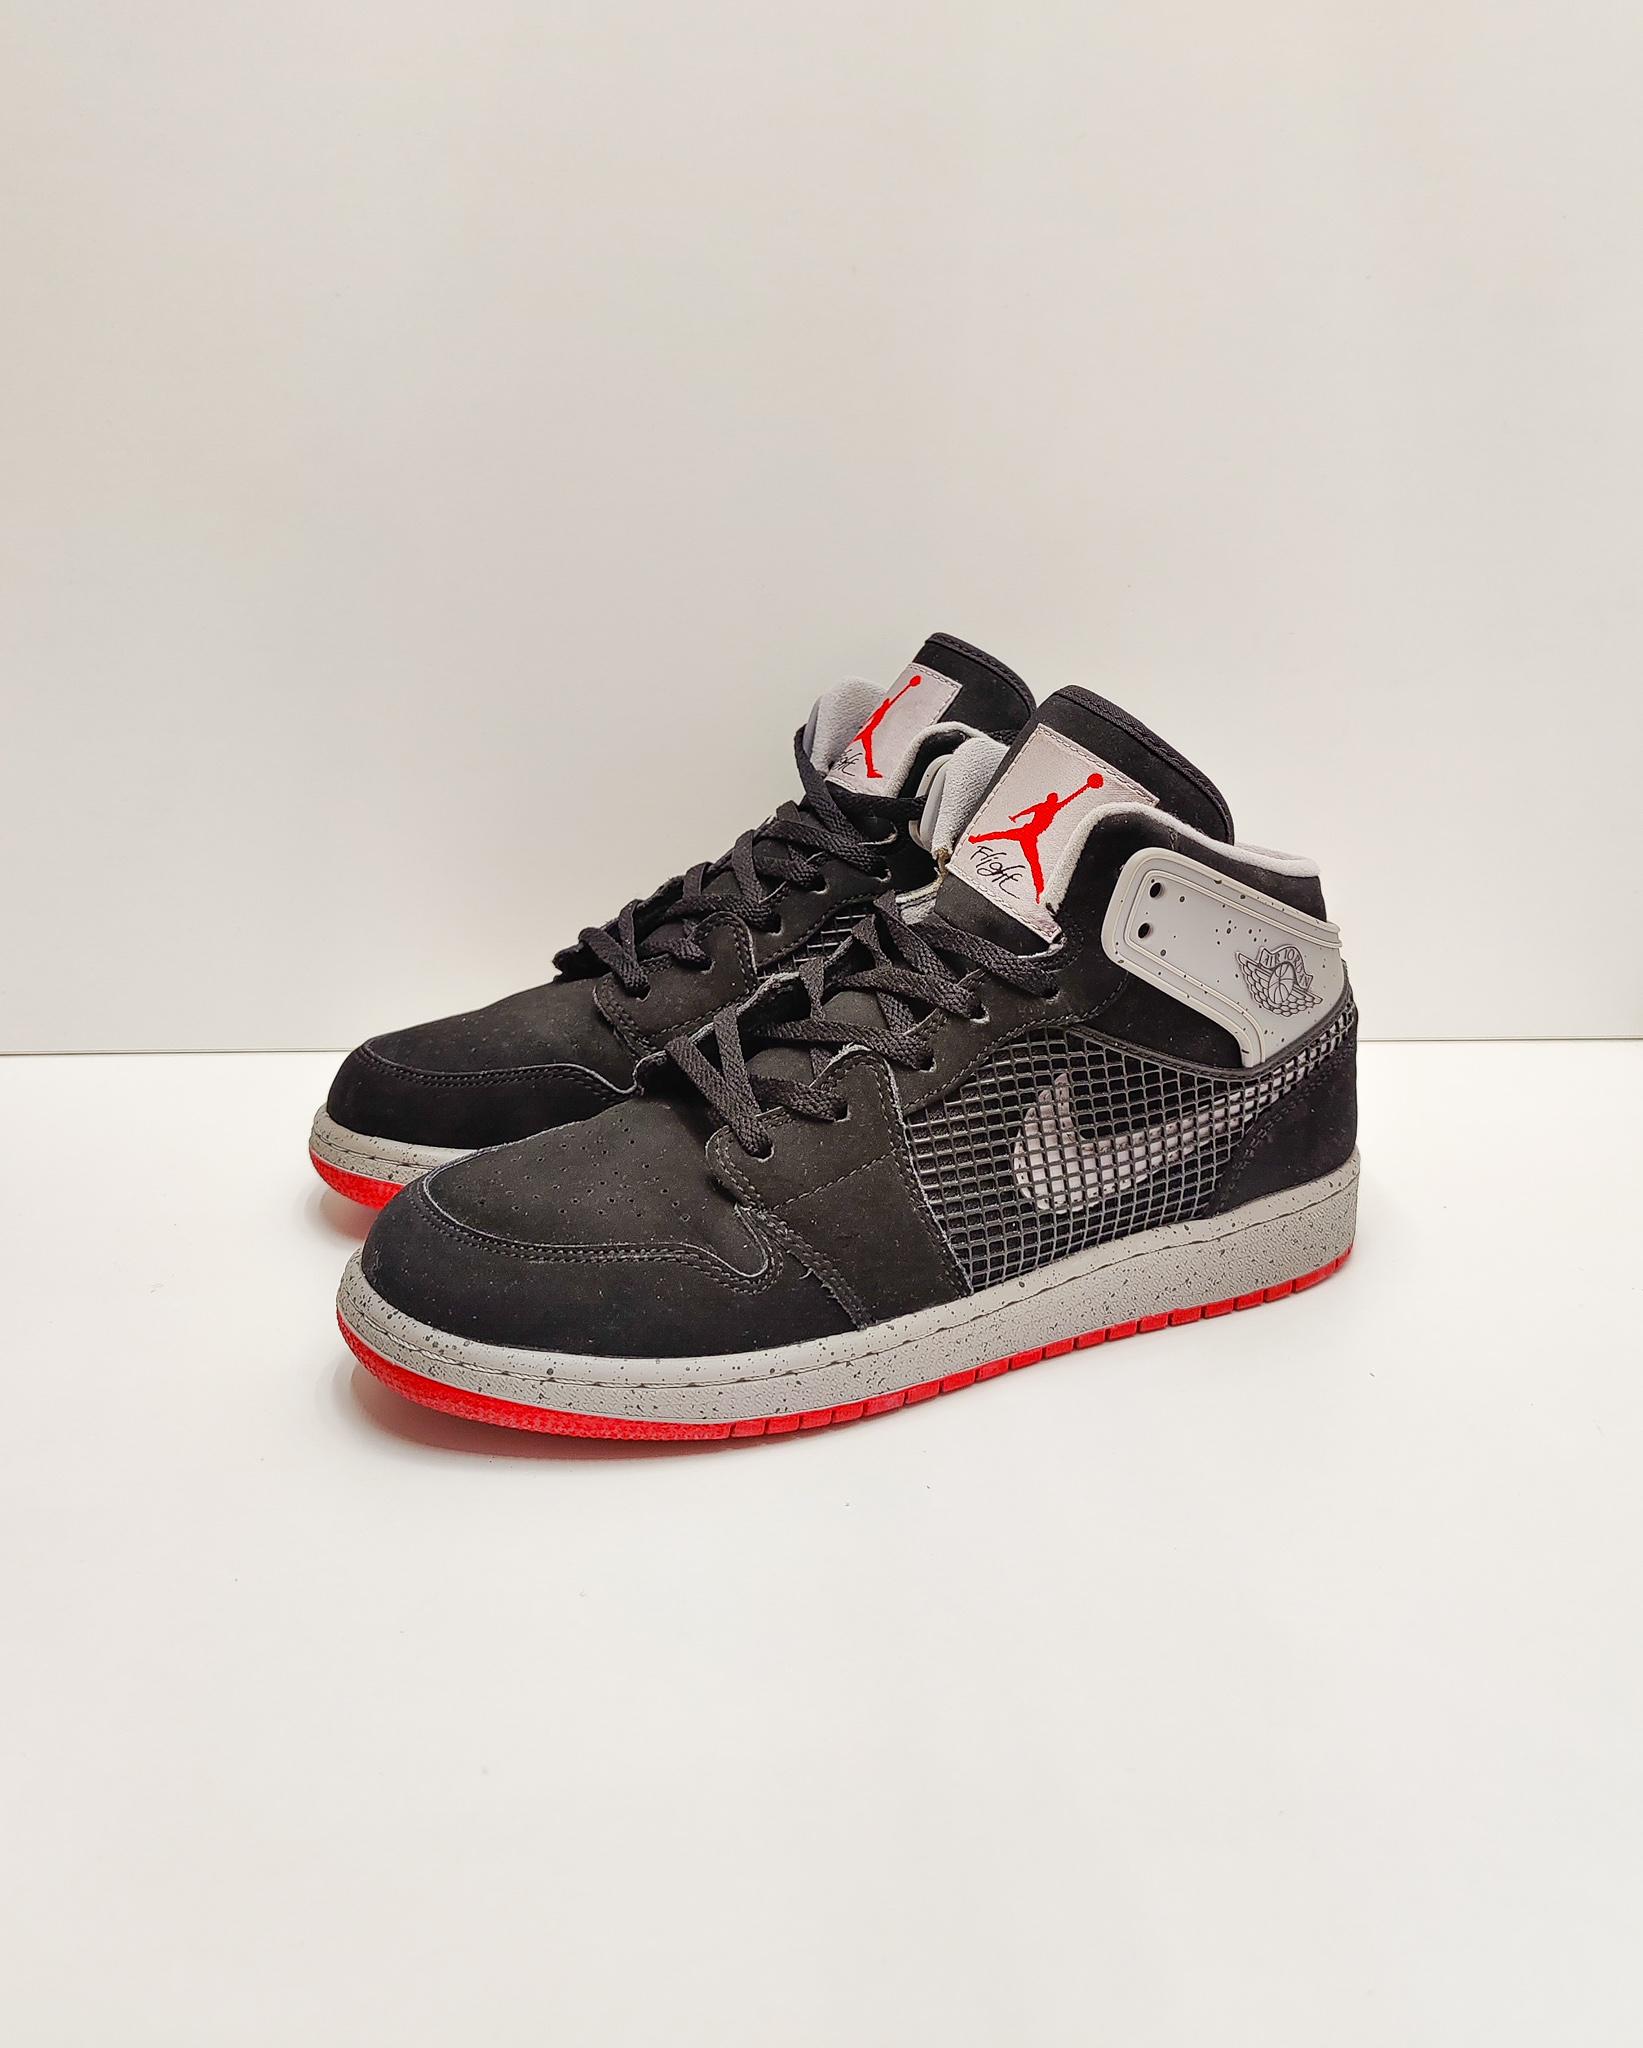 Jordan 1 Retro 89' (GS)